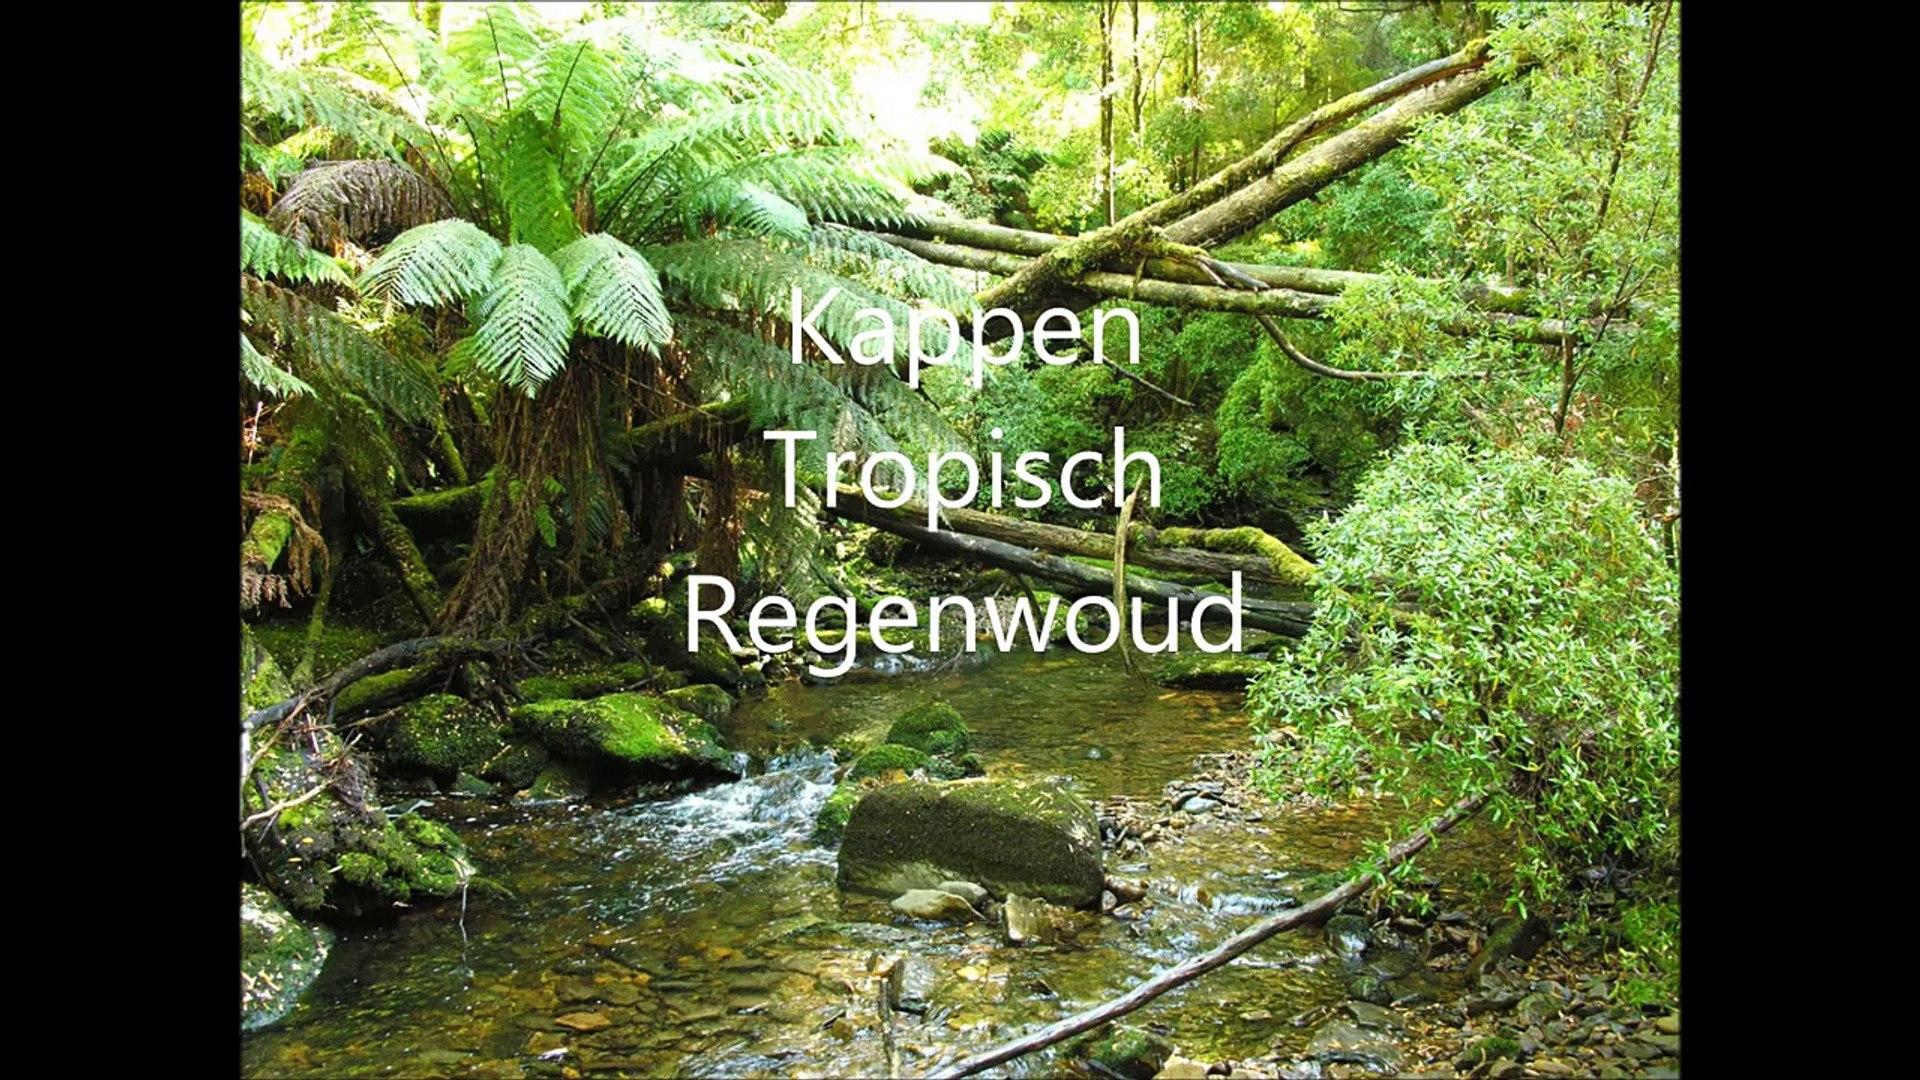 Filmpje Kappen Tropisch Regenwoud Wlmp 456778